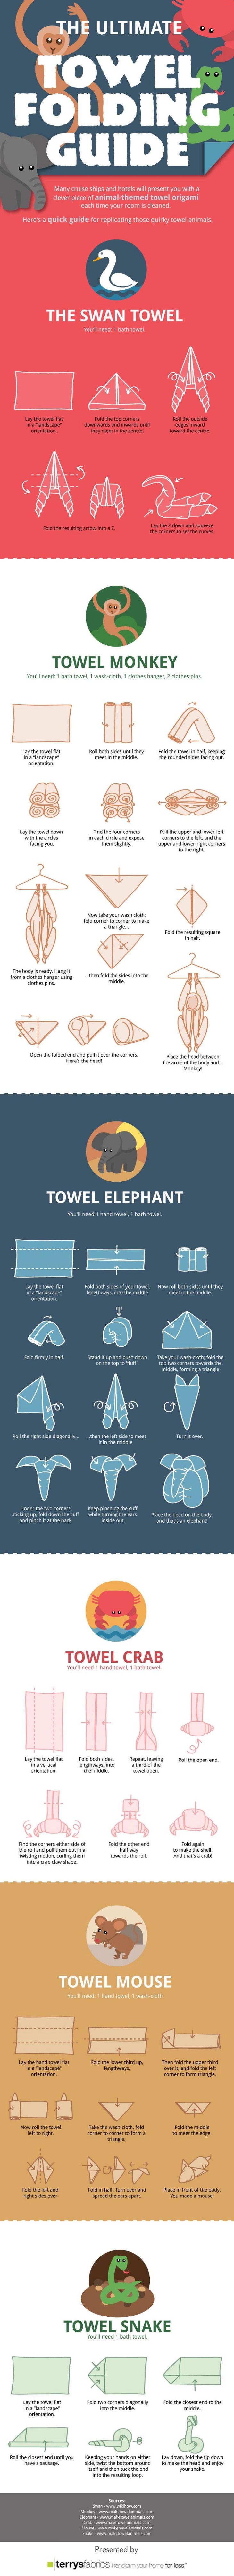 towel, folding, guide